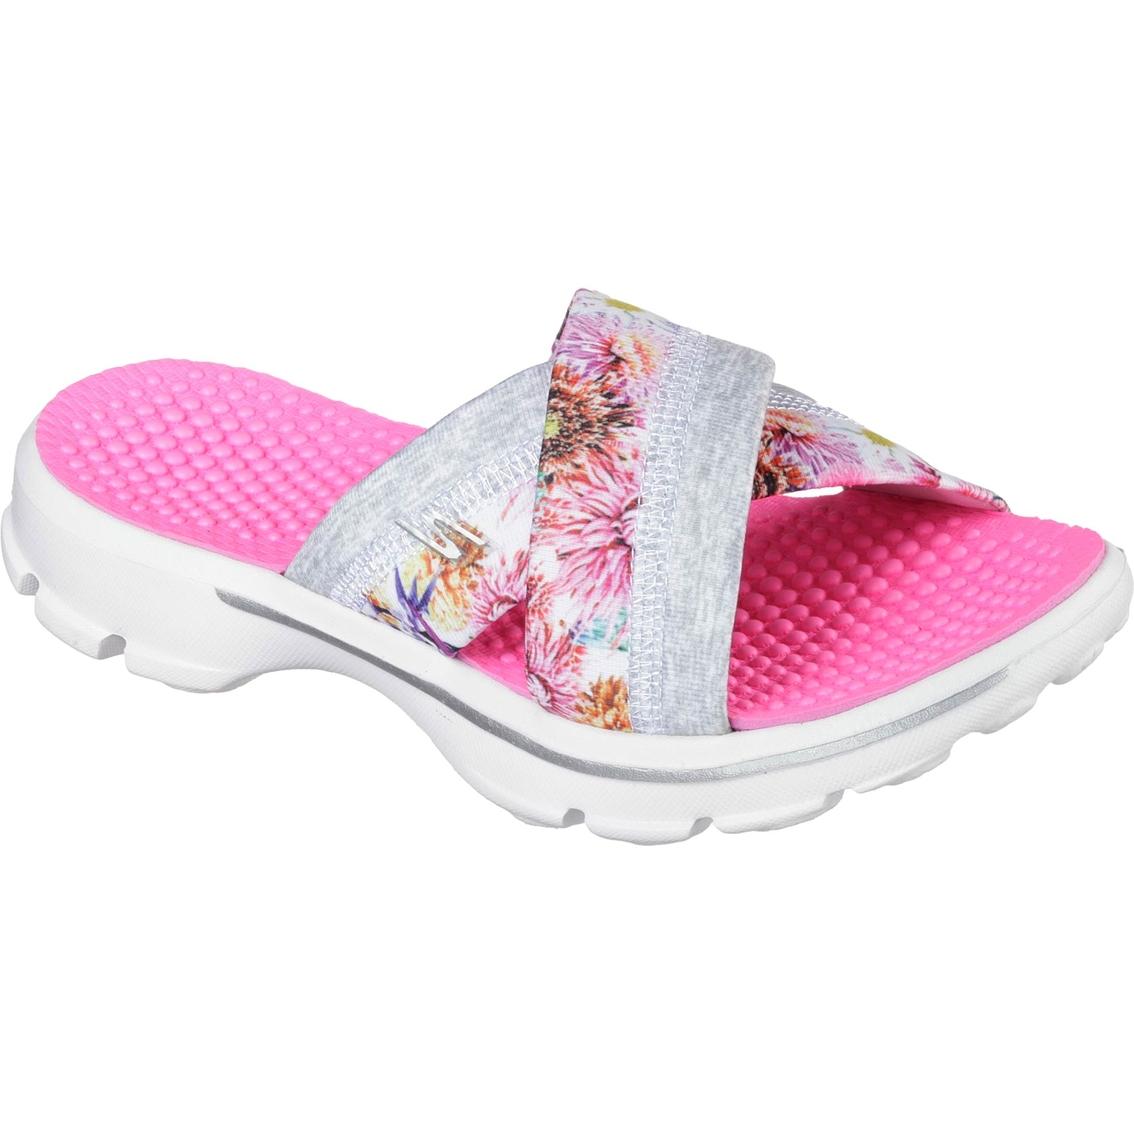 Skechers Women's Go Walk Fuji Sandals | Flats | Shoes | Shop